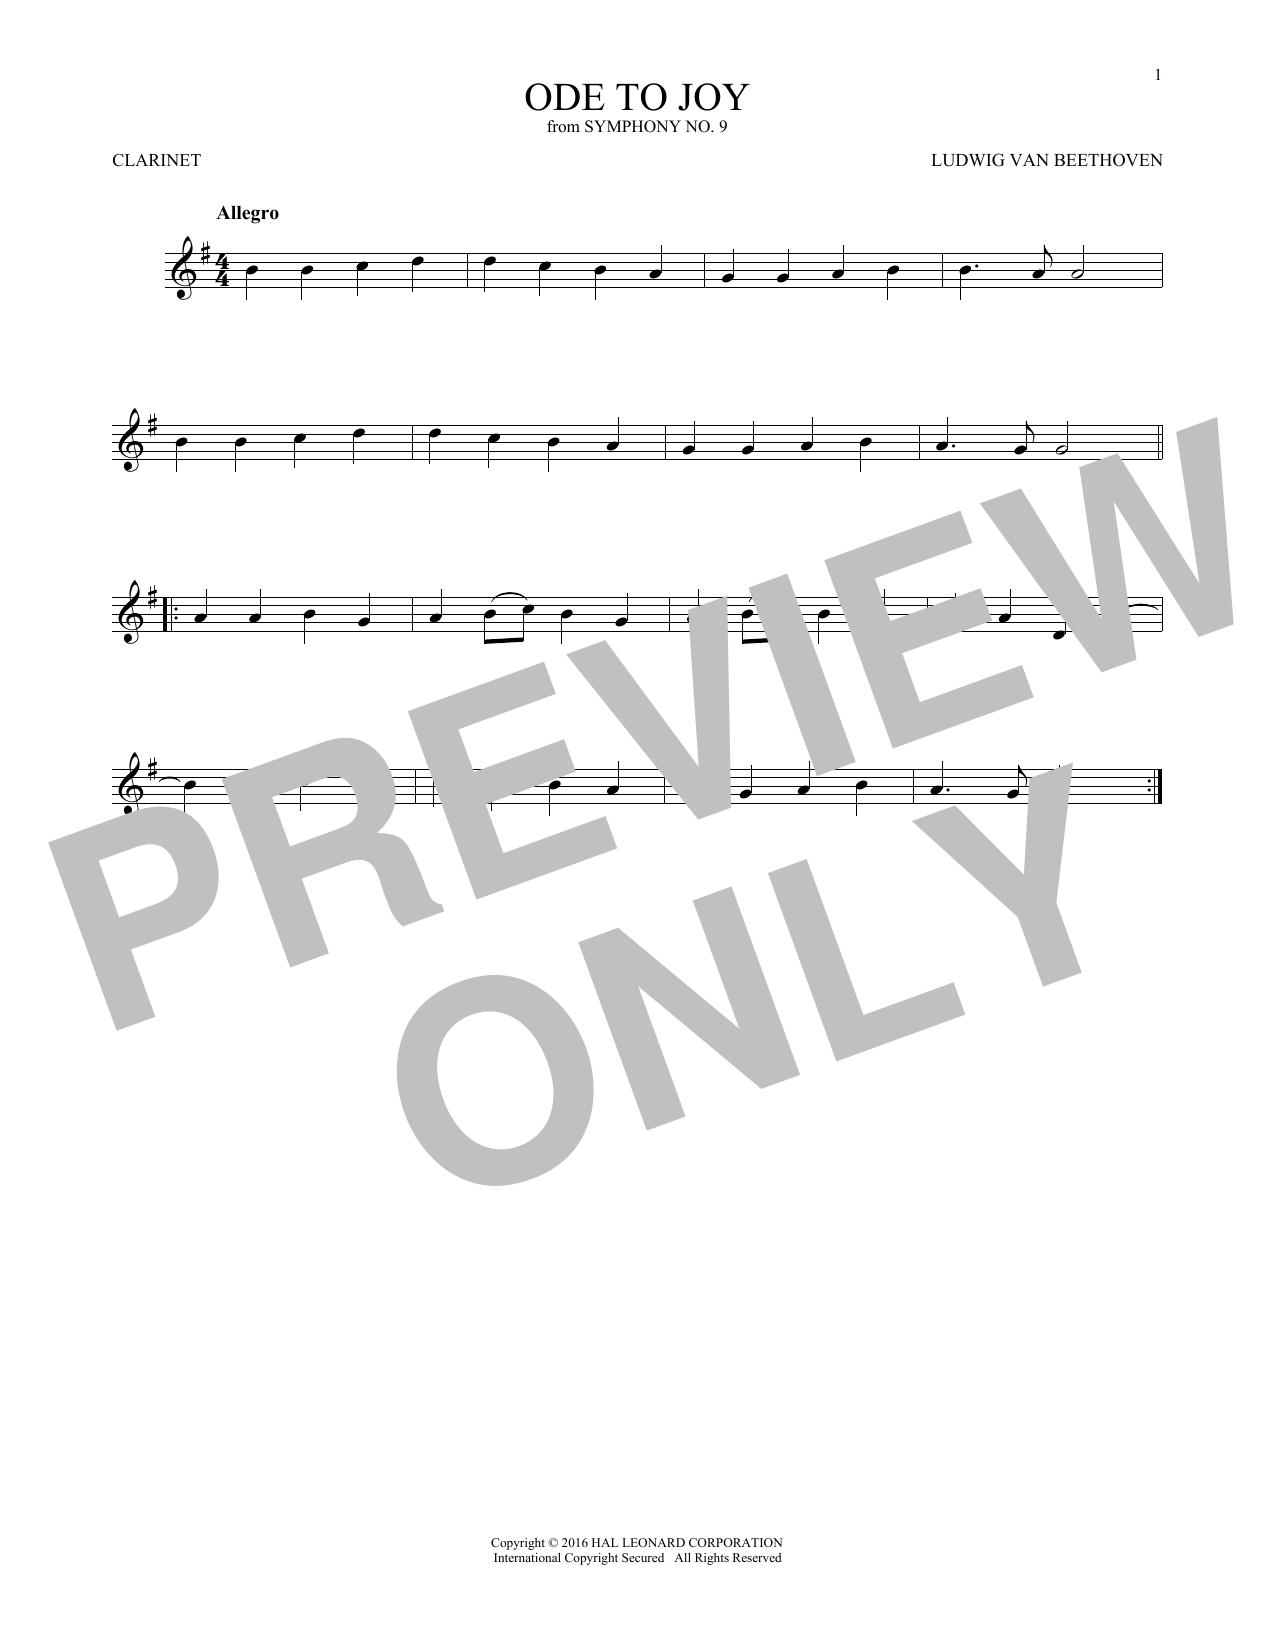 Ode To Joy (Clarinet Solo)